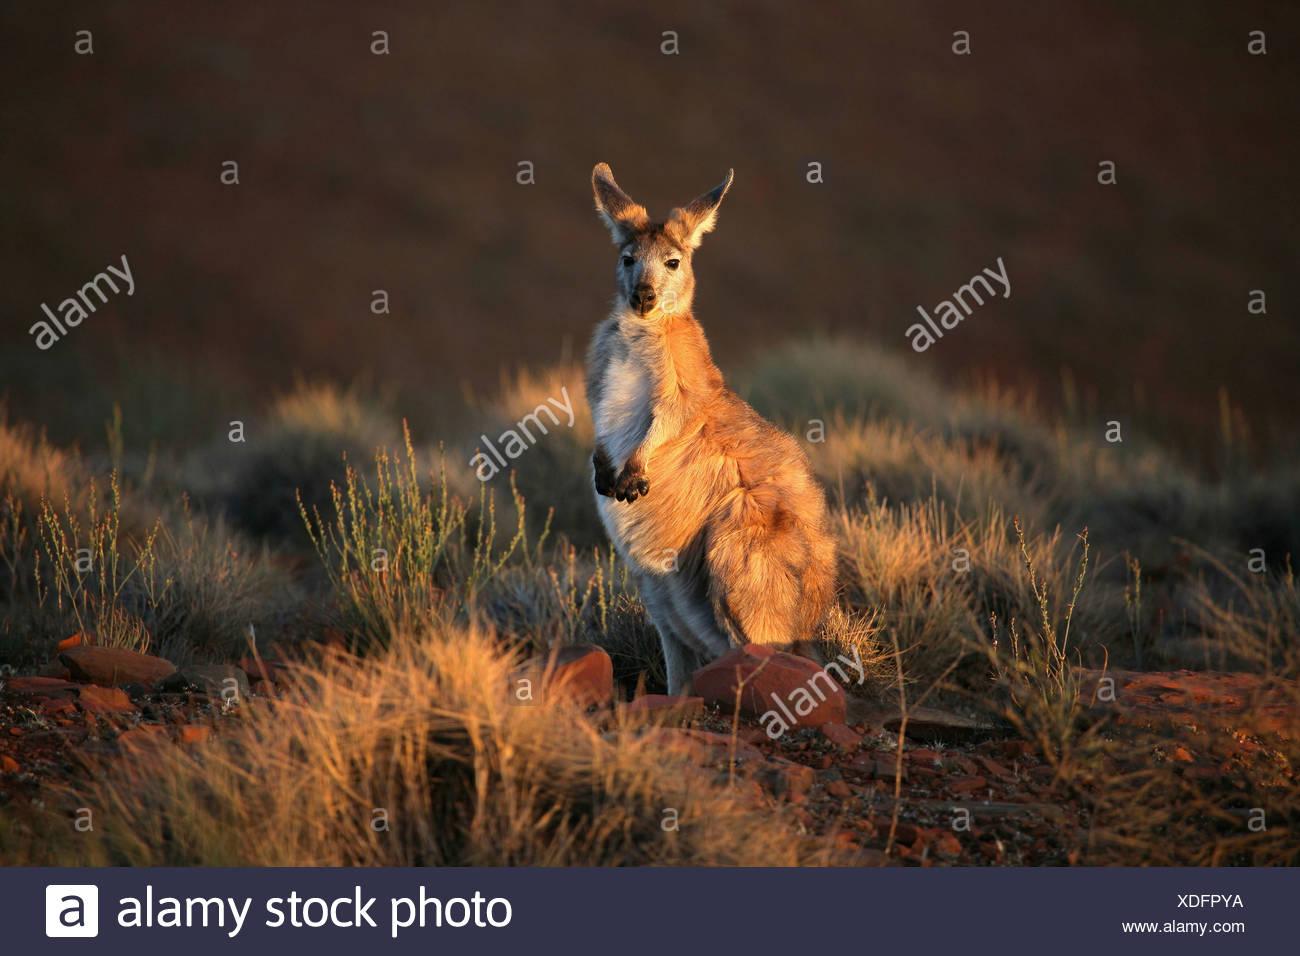 Kangaroo in una foresta, Flinders Ranges, South Australia, Australia Immagini Stock